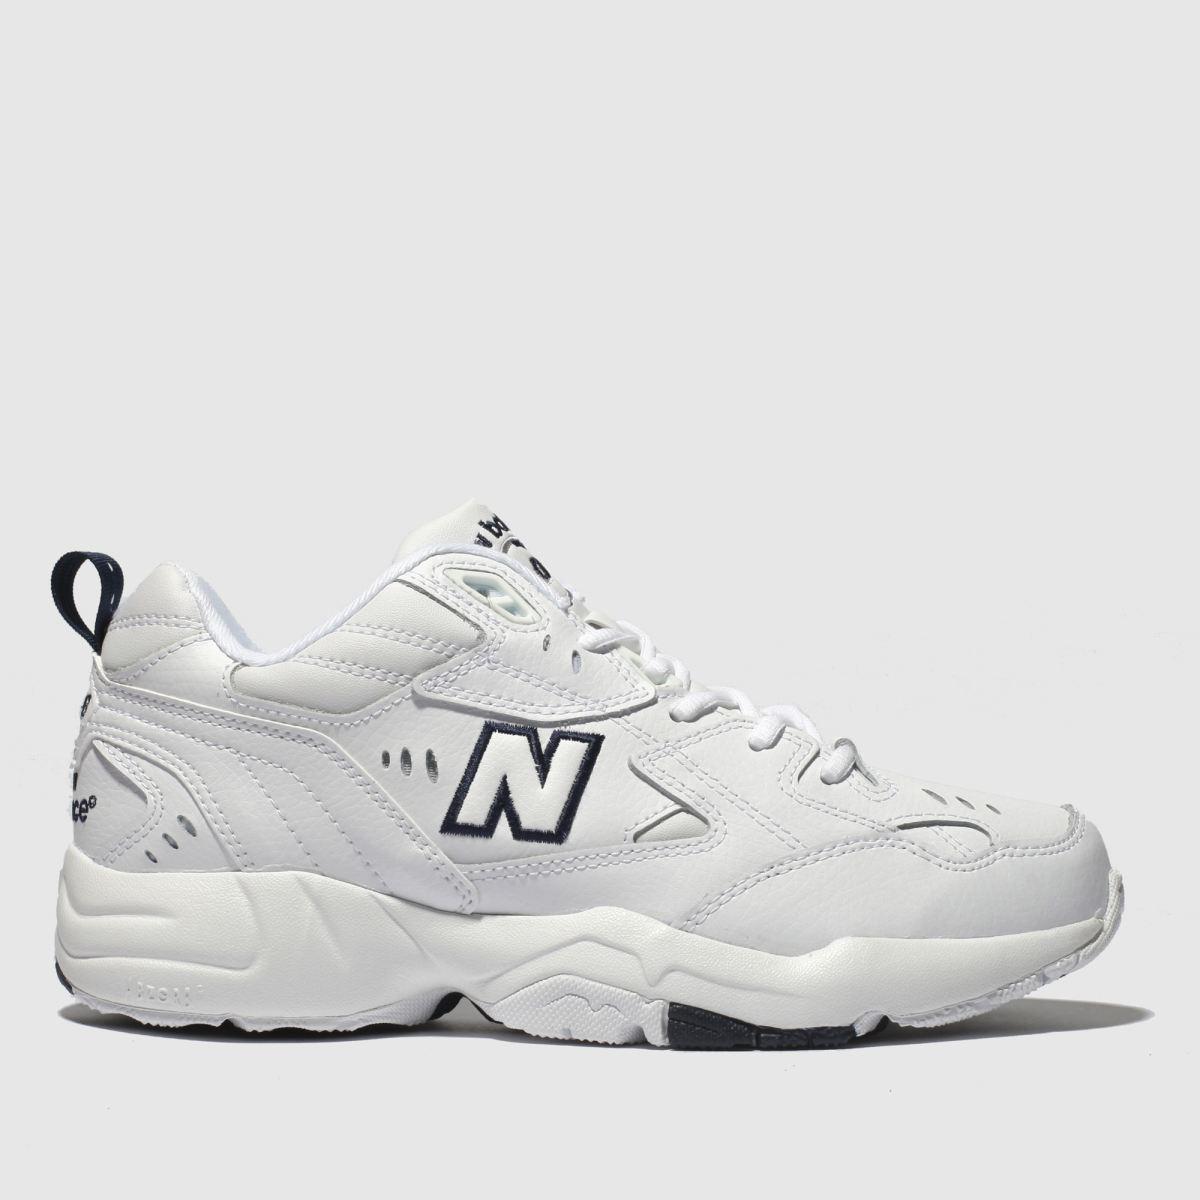 New Balance New Balance White & Navy 608 V3 Trainers